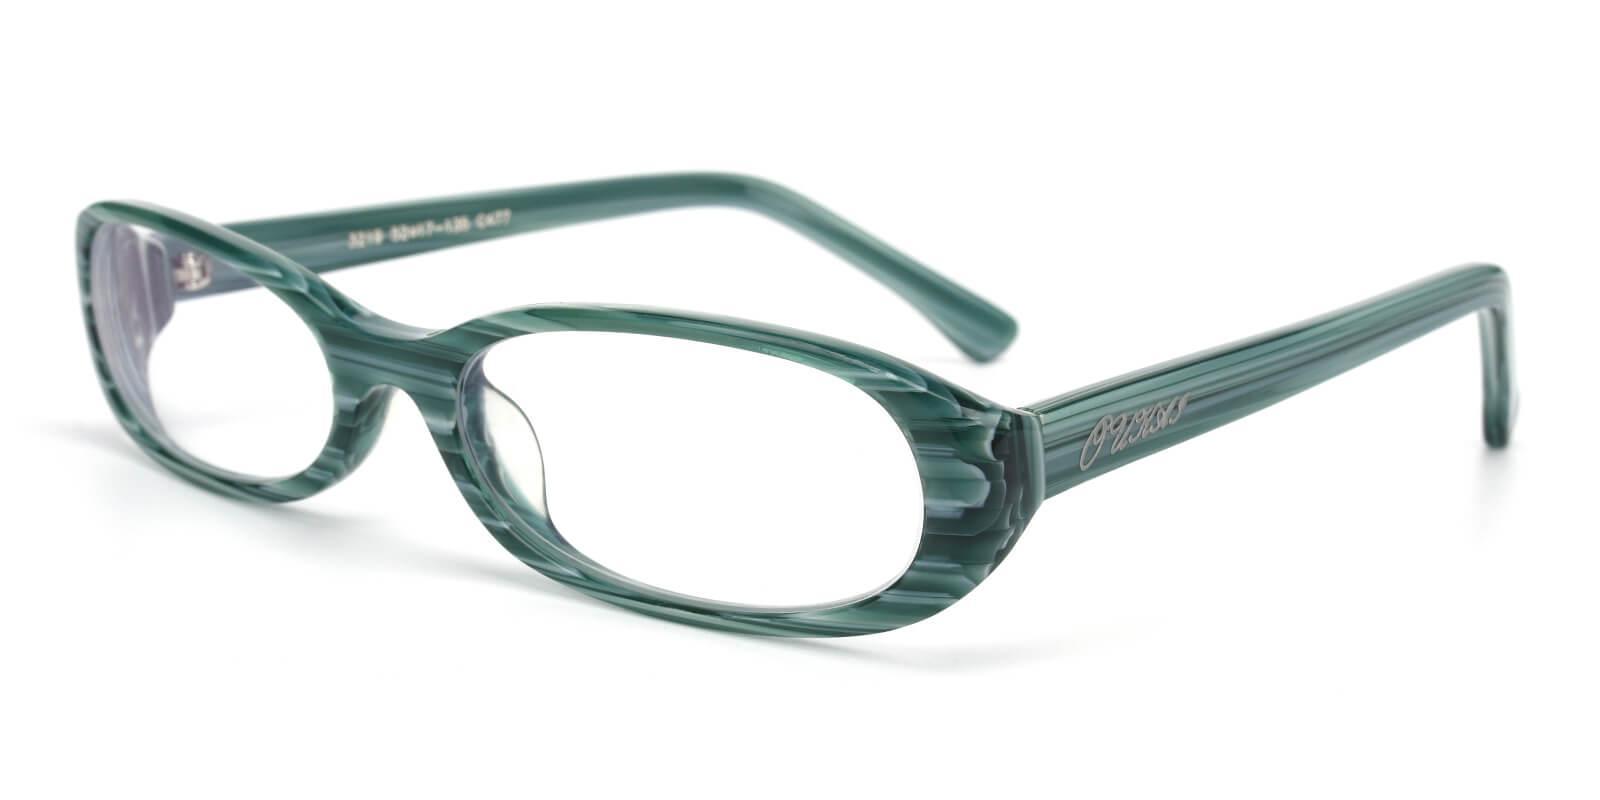 Opla-Green-Rectangle-Acetate-Eyeglasses-additional1